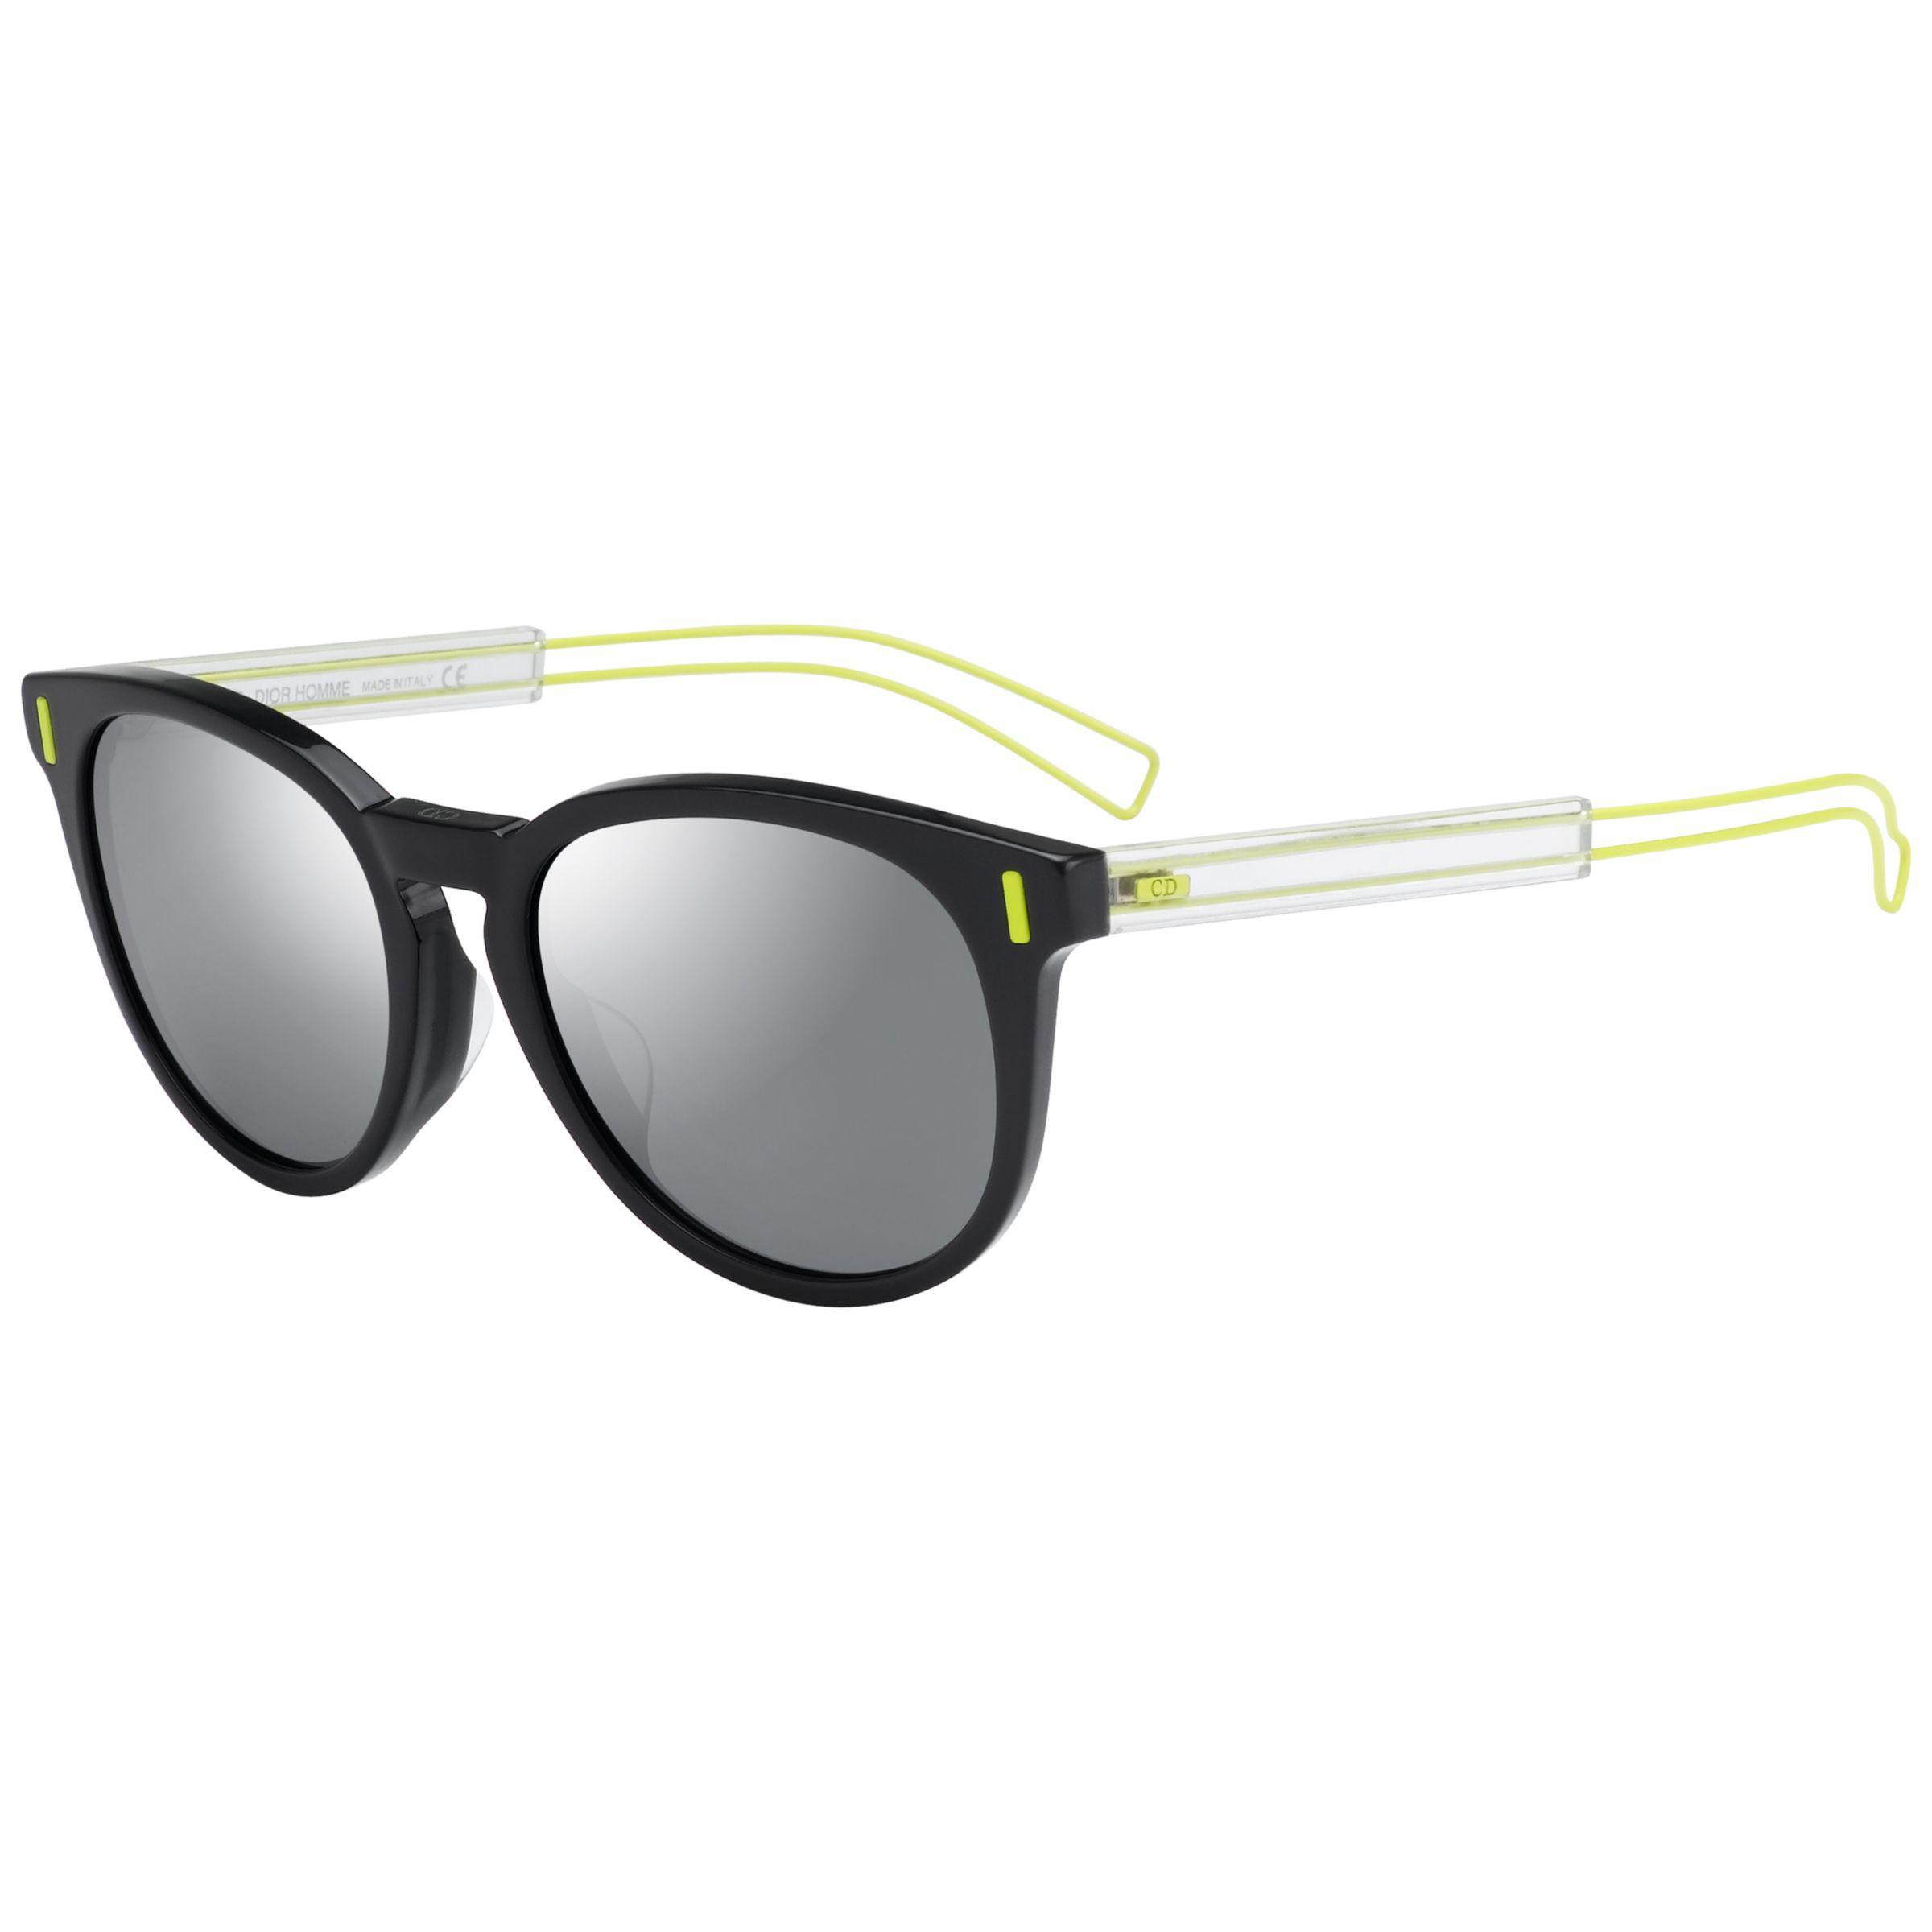 a2c0b7921df3 Dior Blacktie206fs Round Sunglasses in Black for Men - Lyst